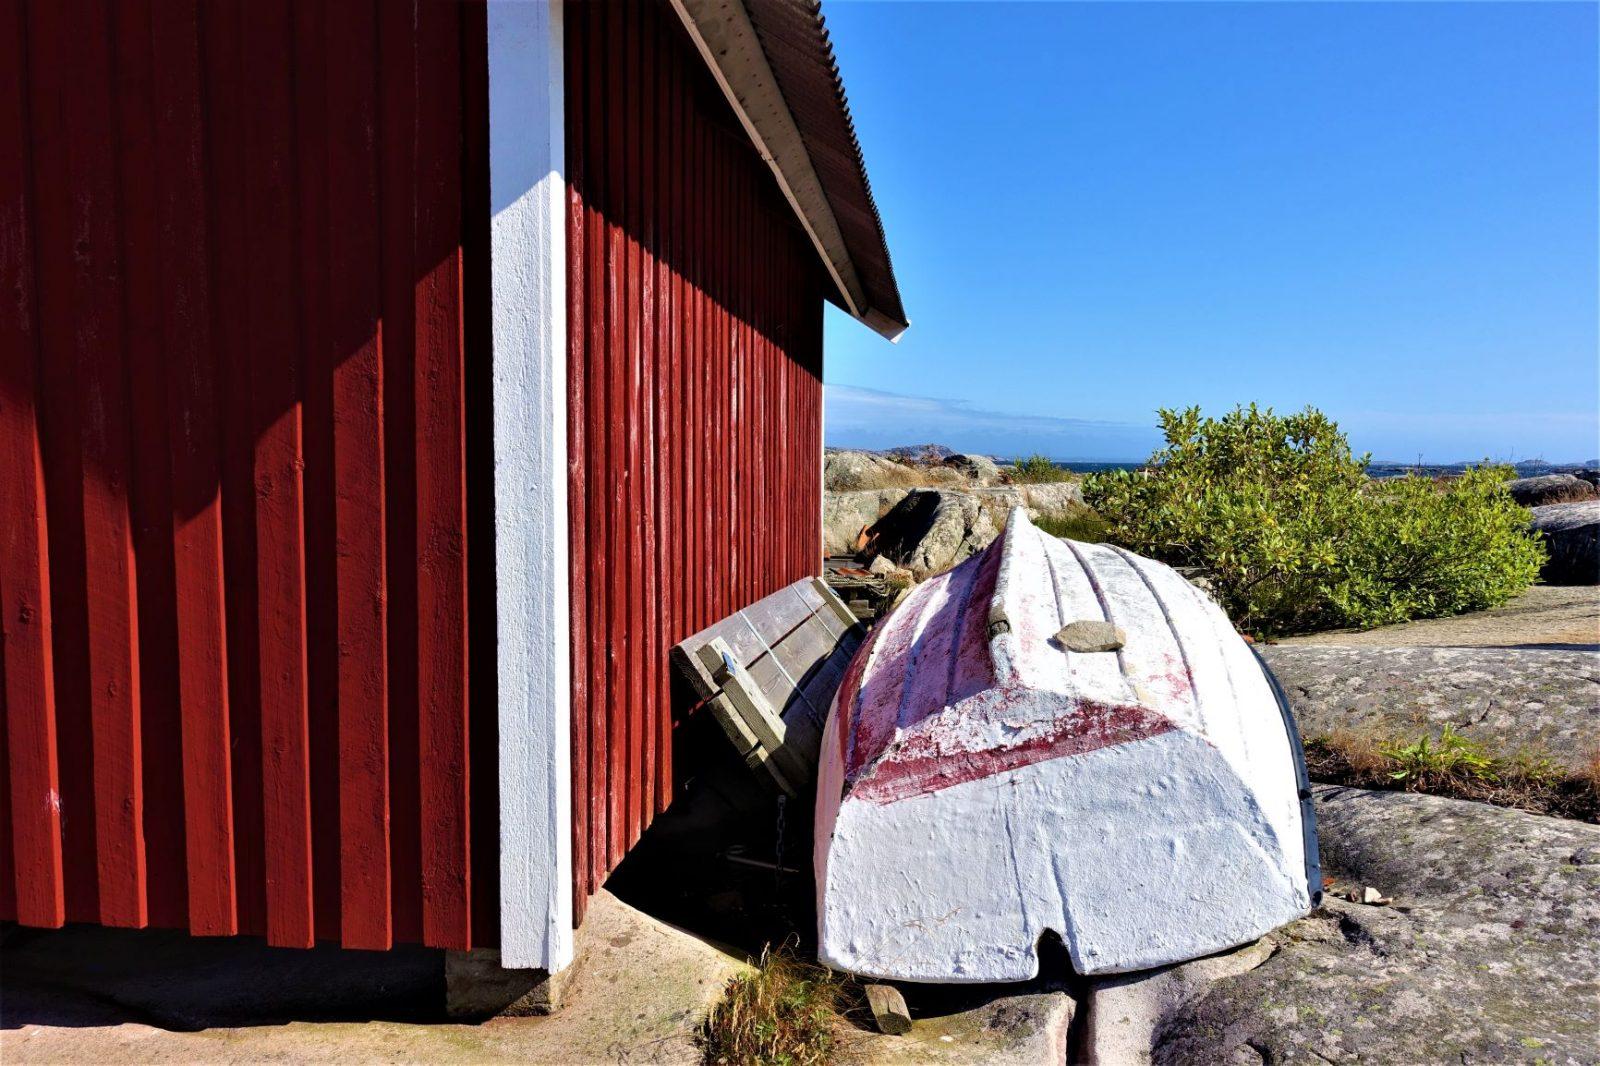 trebåt ligger ved båthuset bohus malmøn